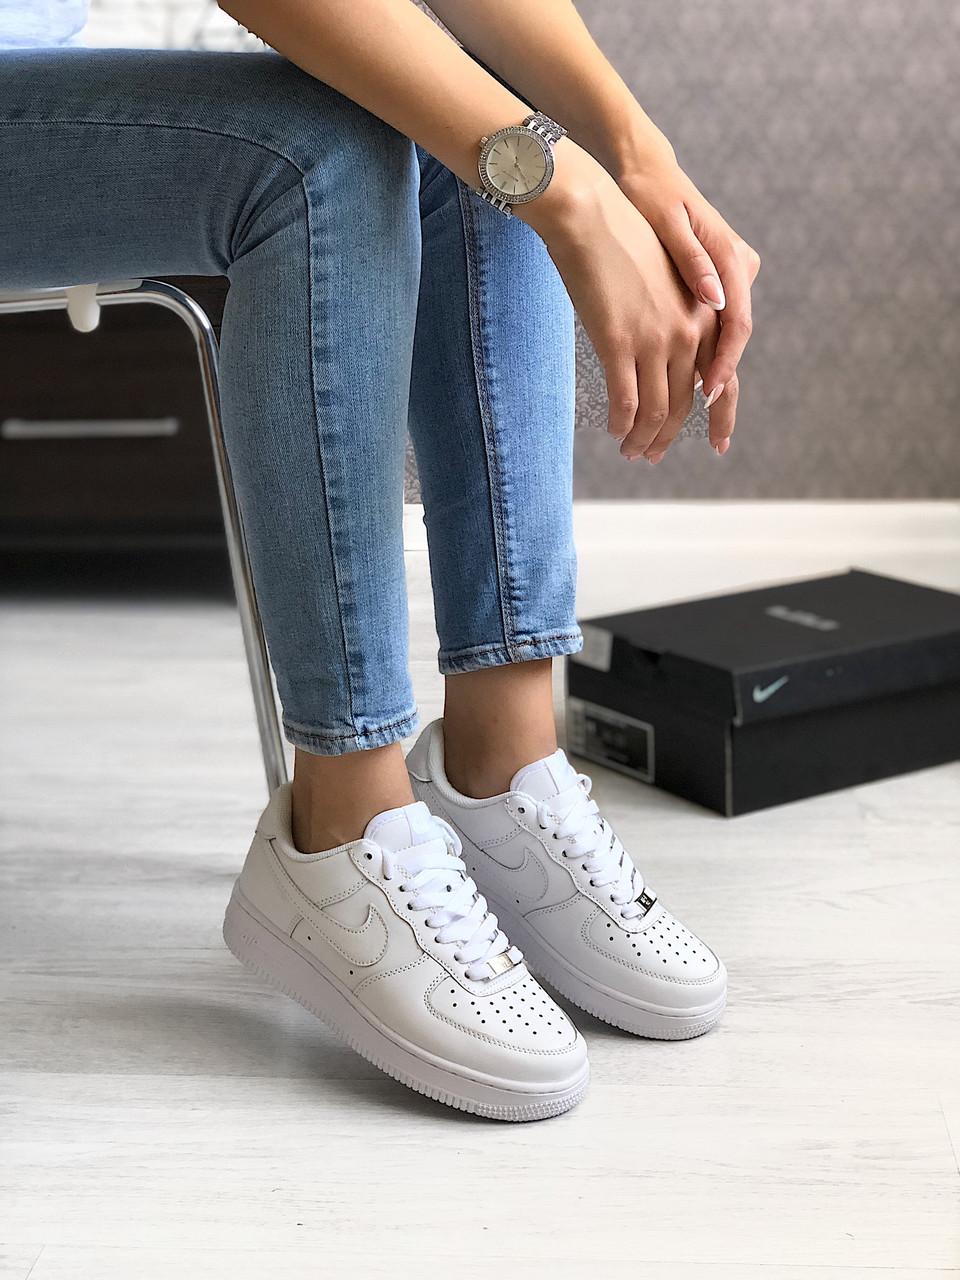 Кросівки Nike Air Force 1 White / Найк аір форс 1